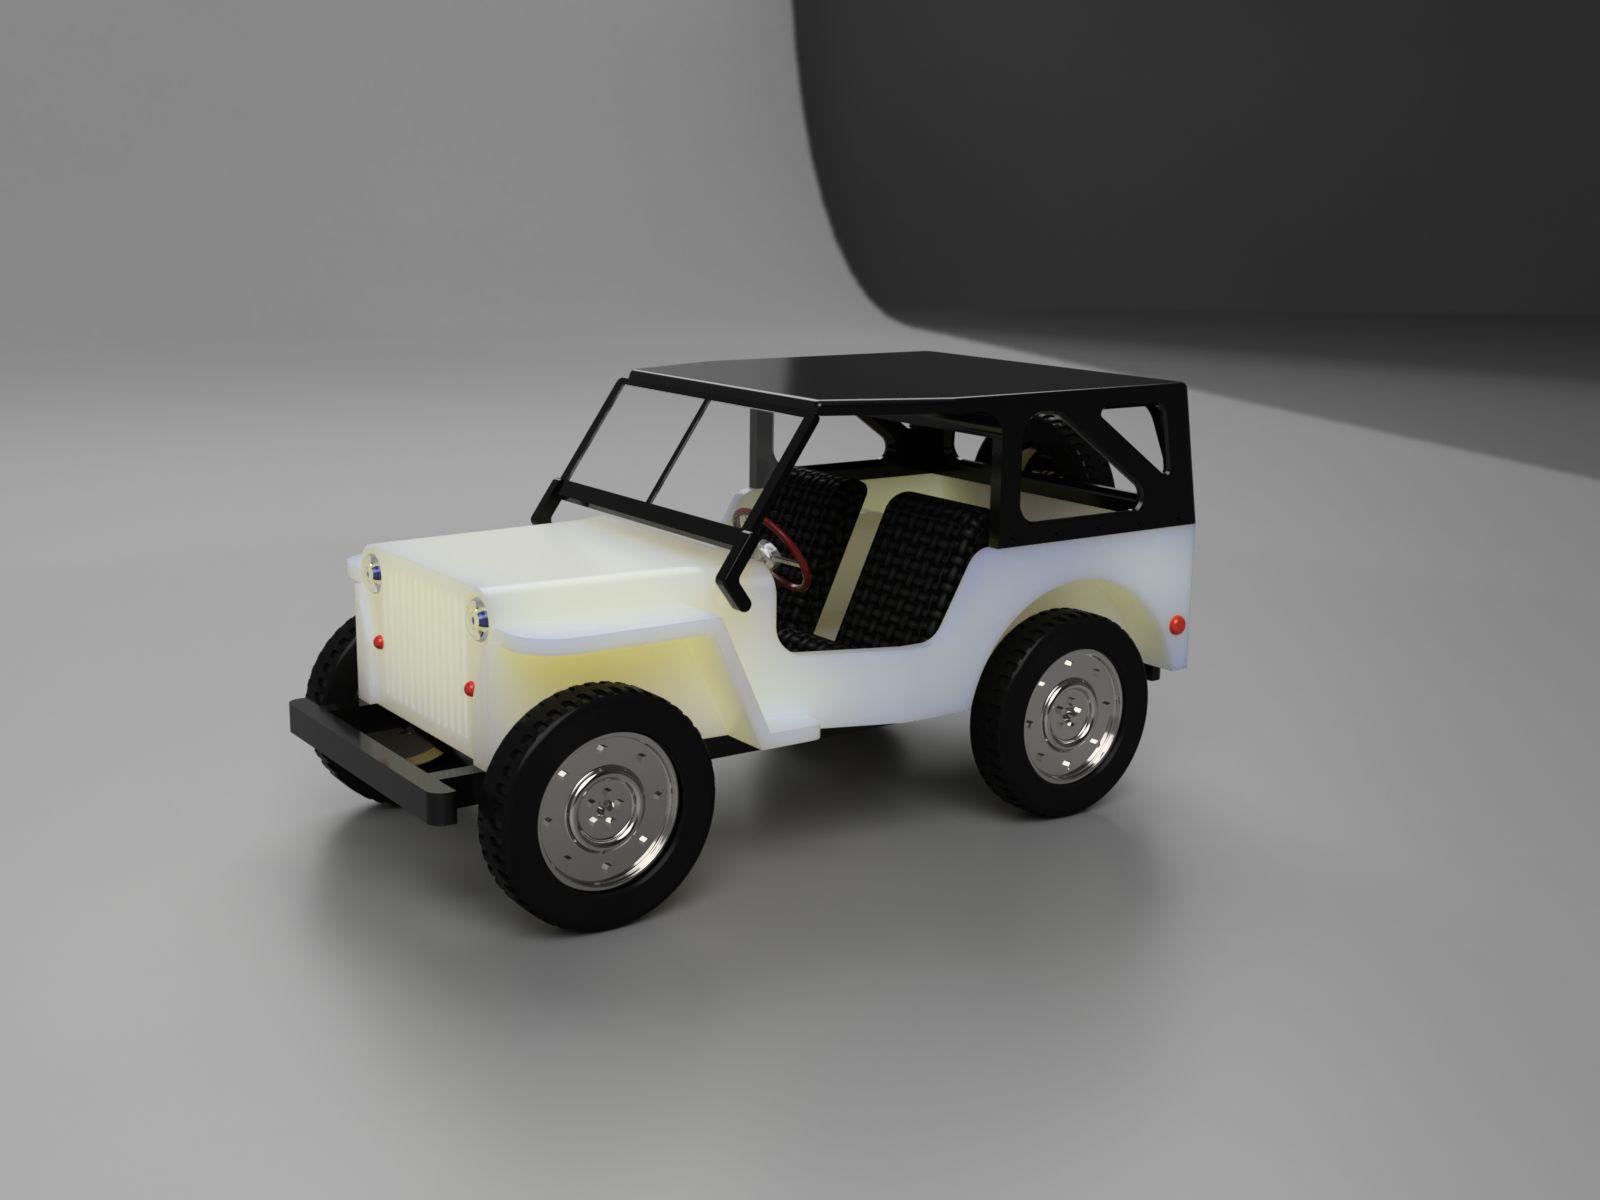 P2-carroceria-2017-aug-01-11-59-43pm-000-customizedview35465055968-3500-3500